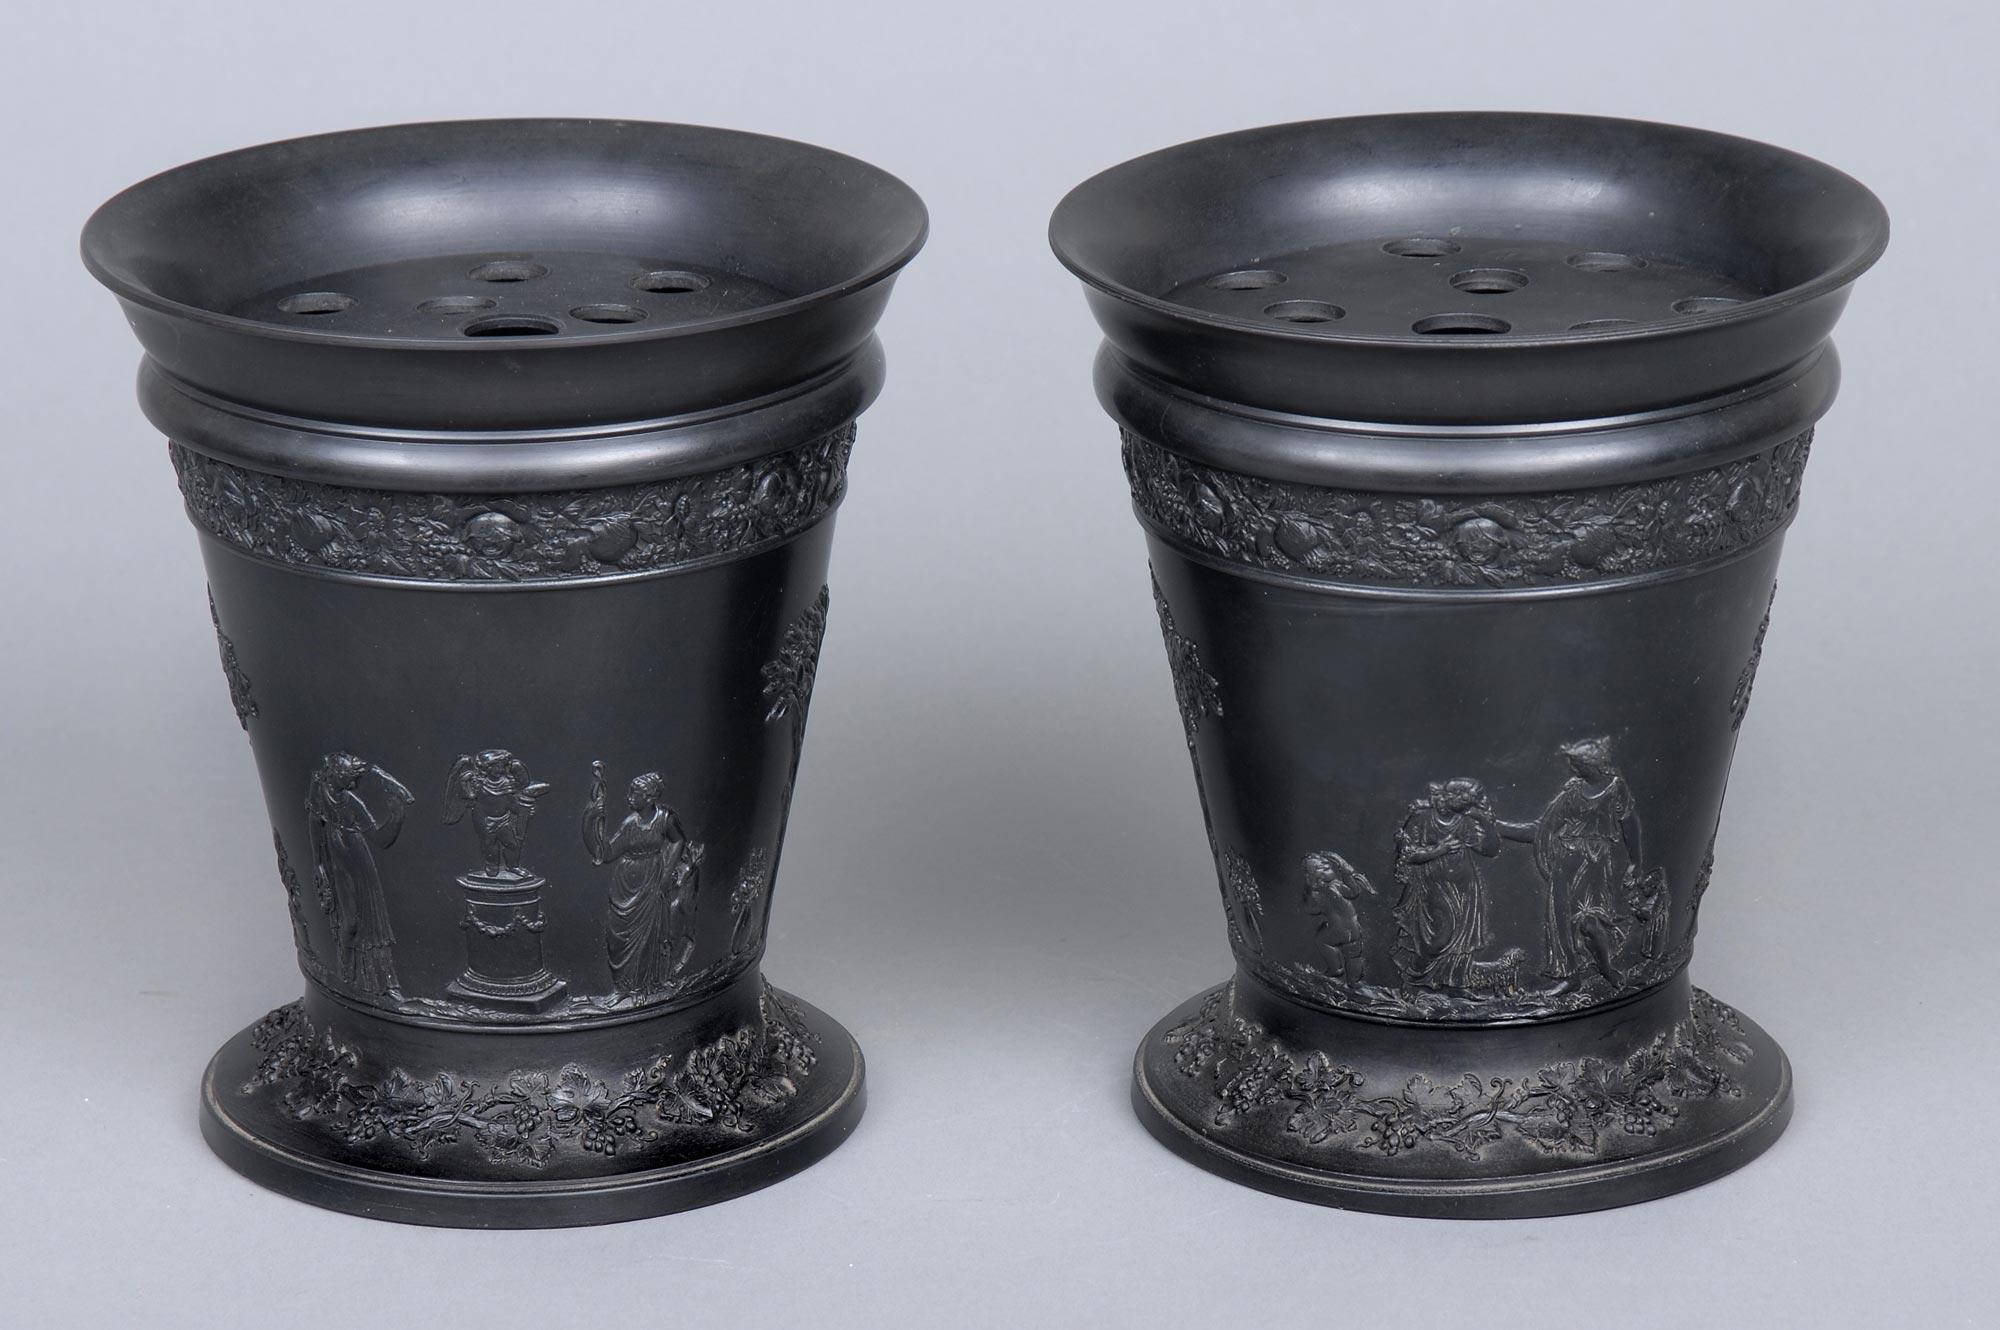 Basalt Flower Pots : Product pair wedgwood basalt bough pots